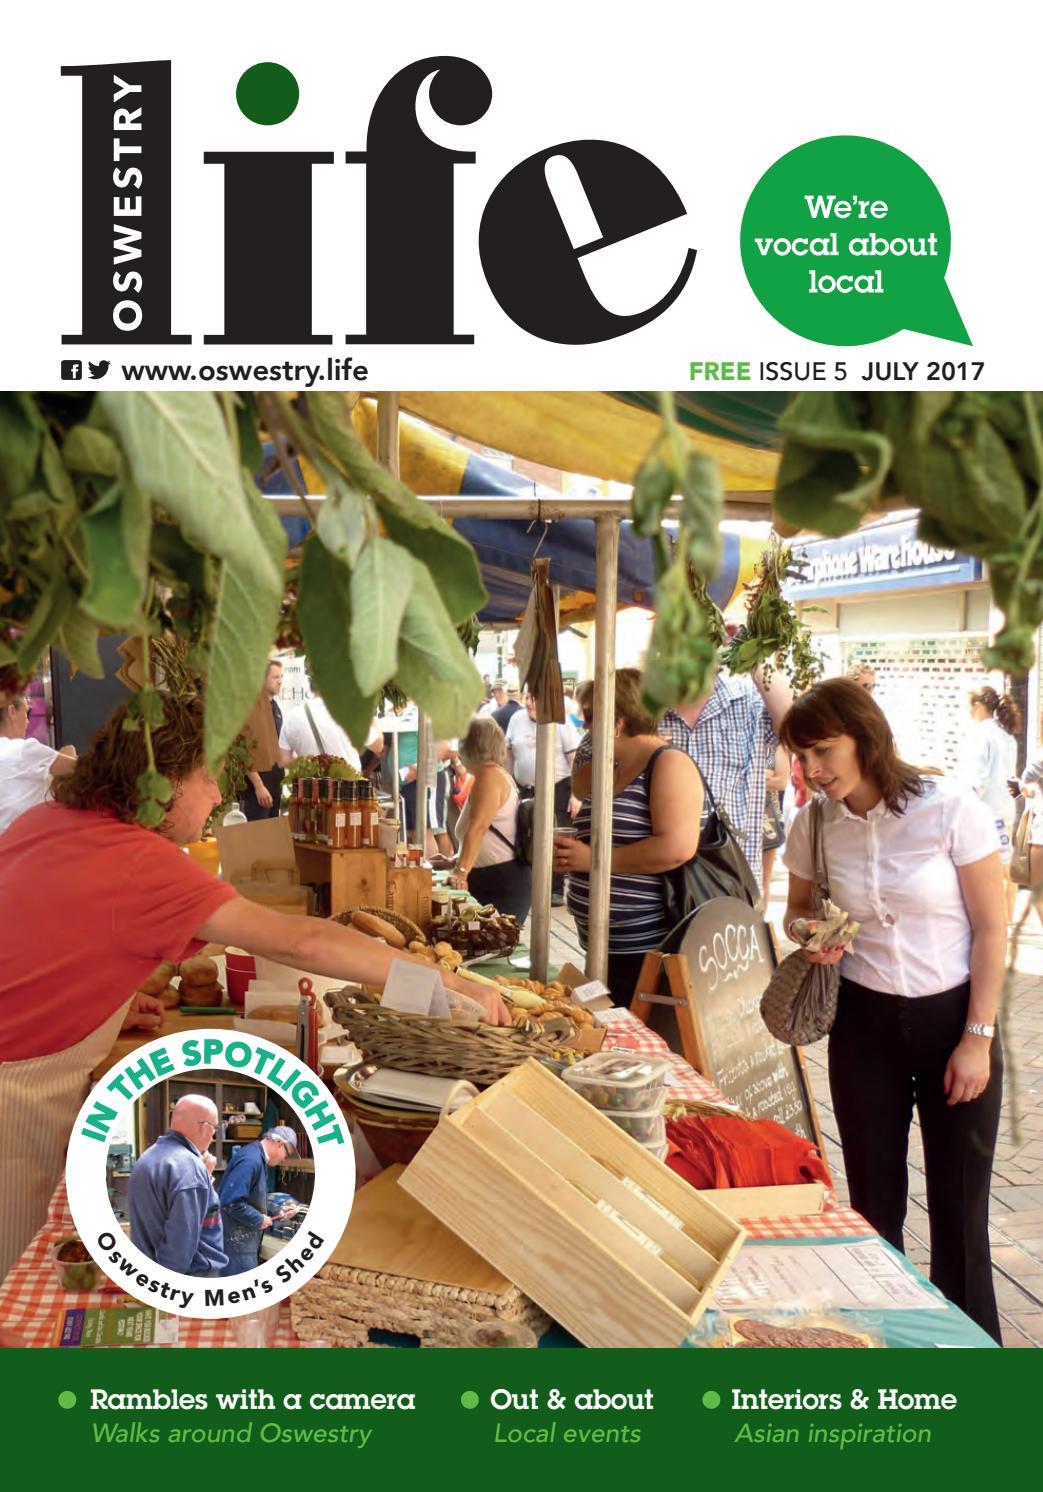 Oswestry life July 2017 by dts media ltd - issuu